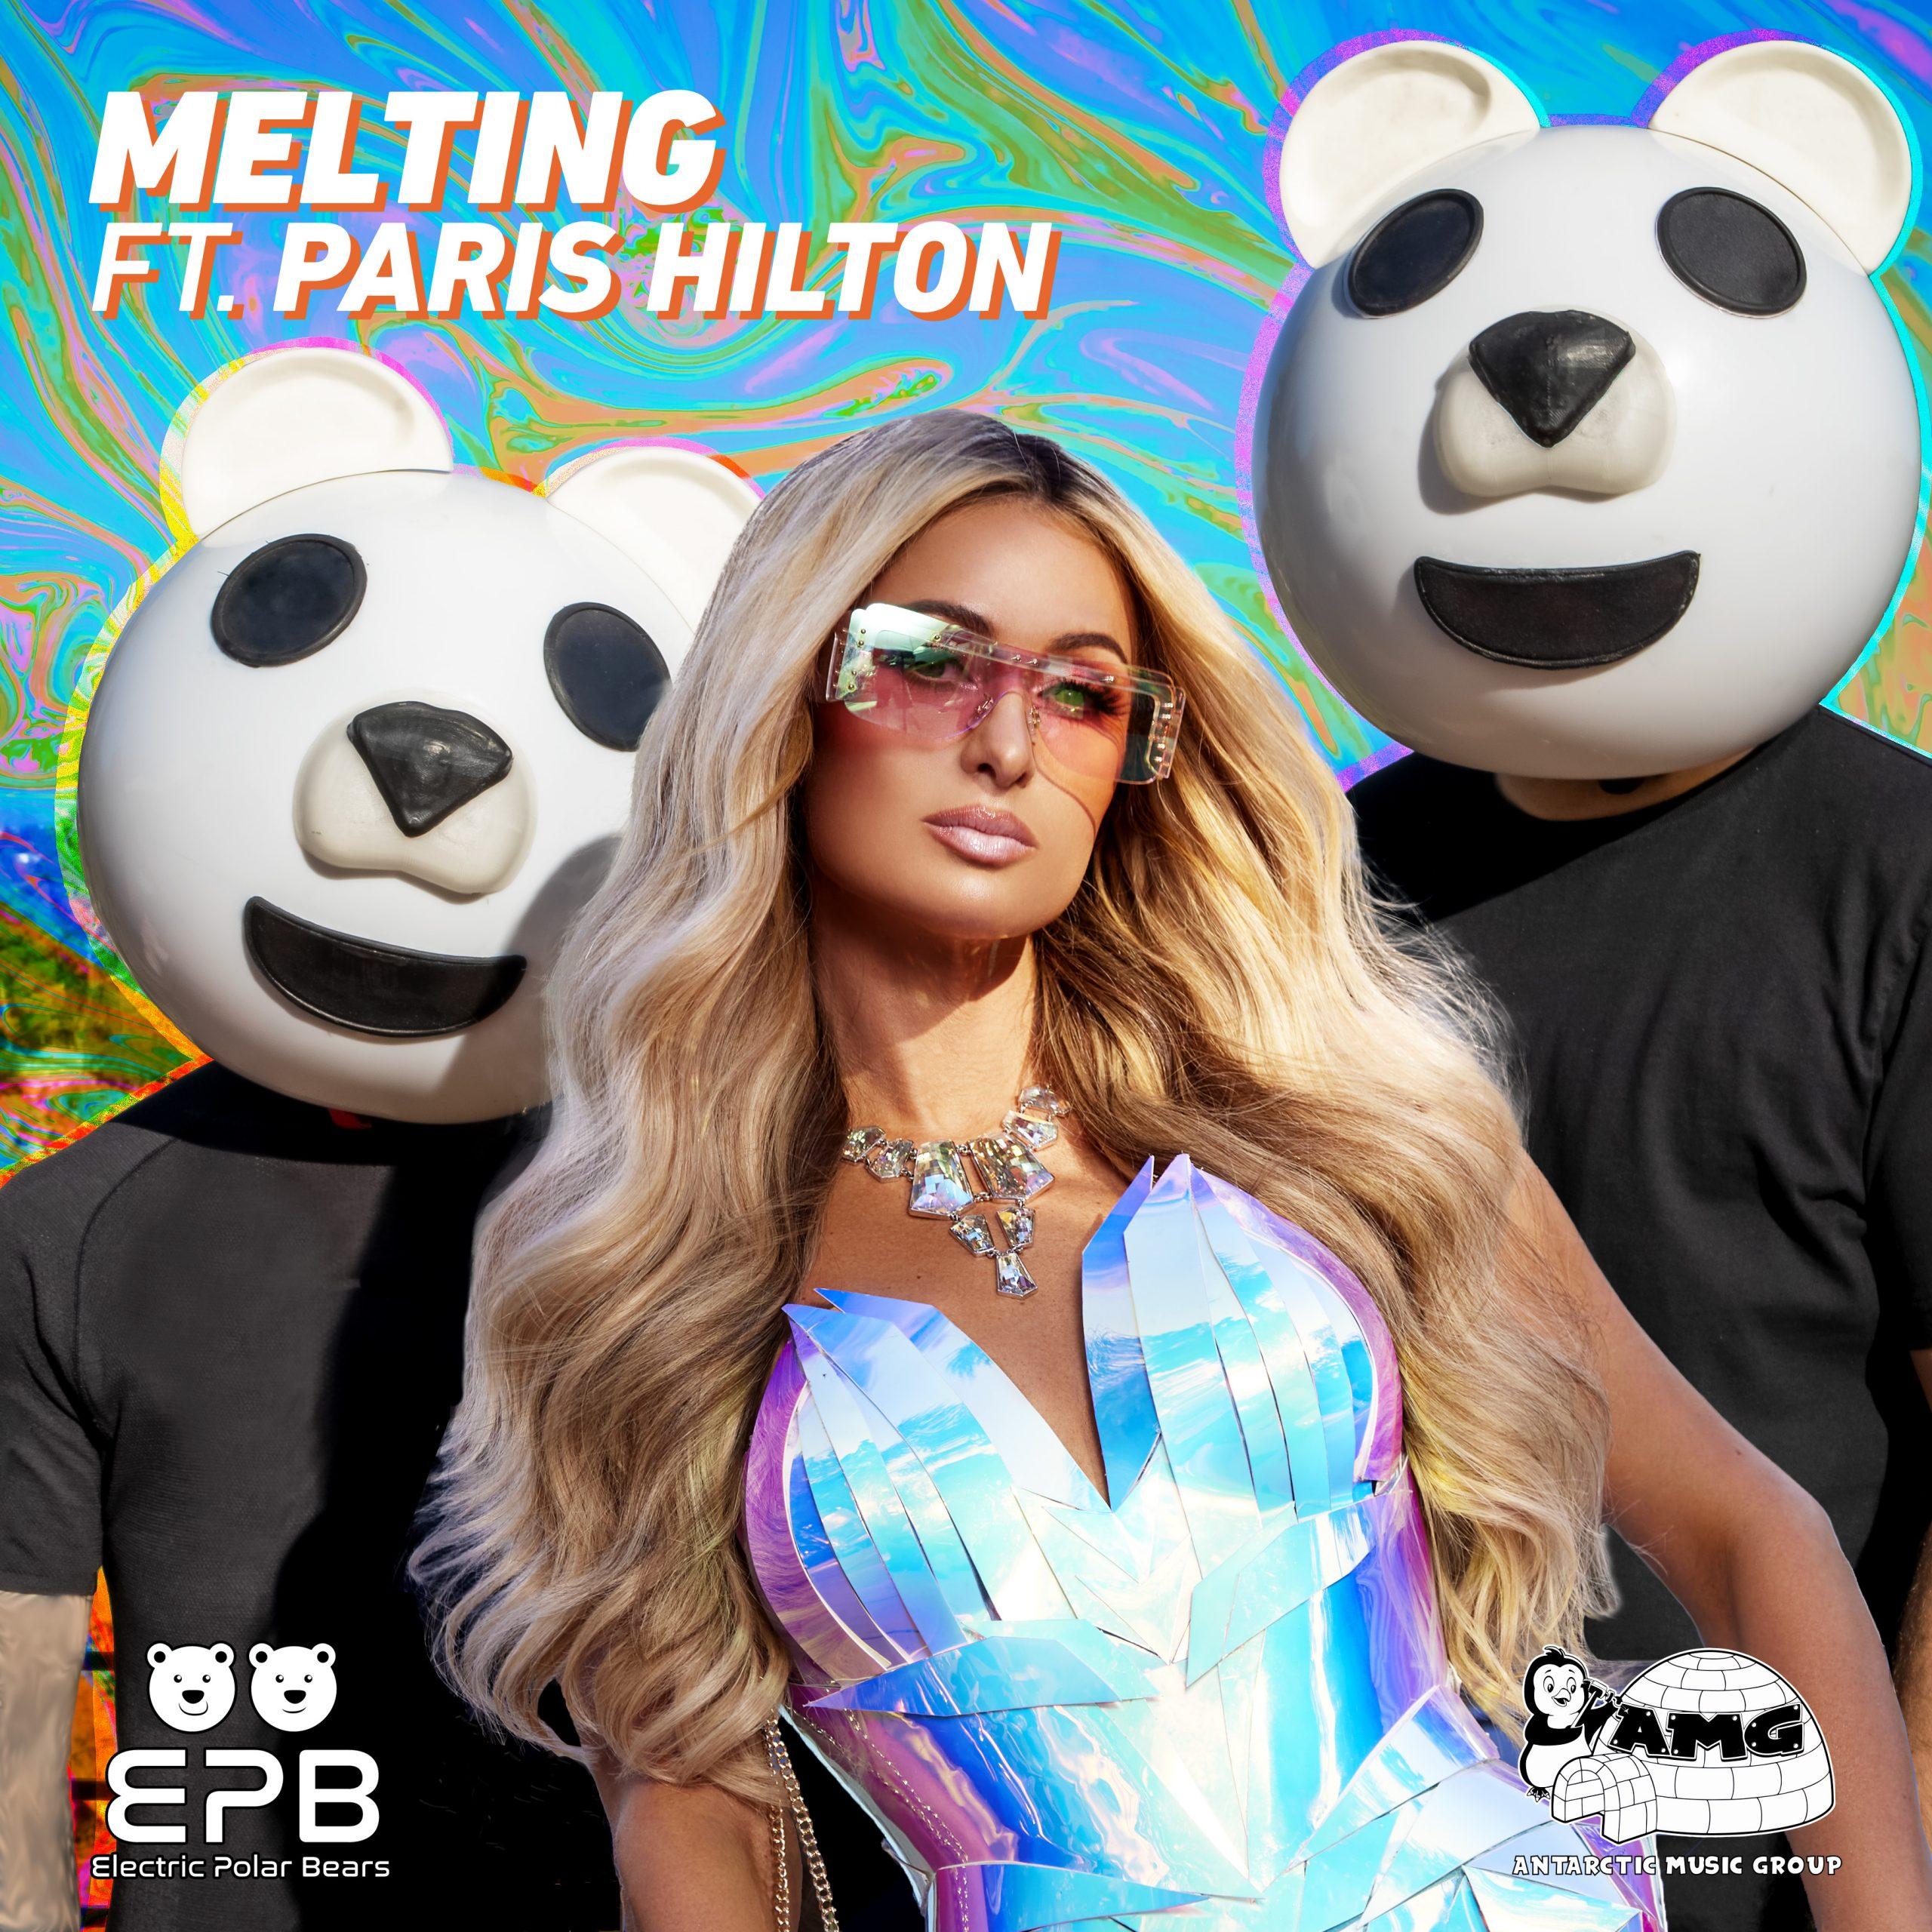 Electric Polar Bears ft. Paris Hilton Melting 1